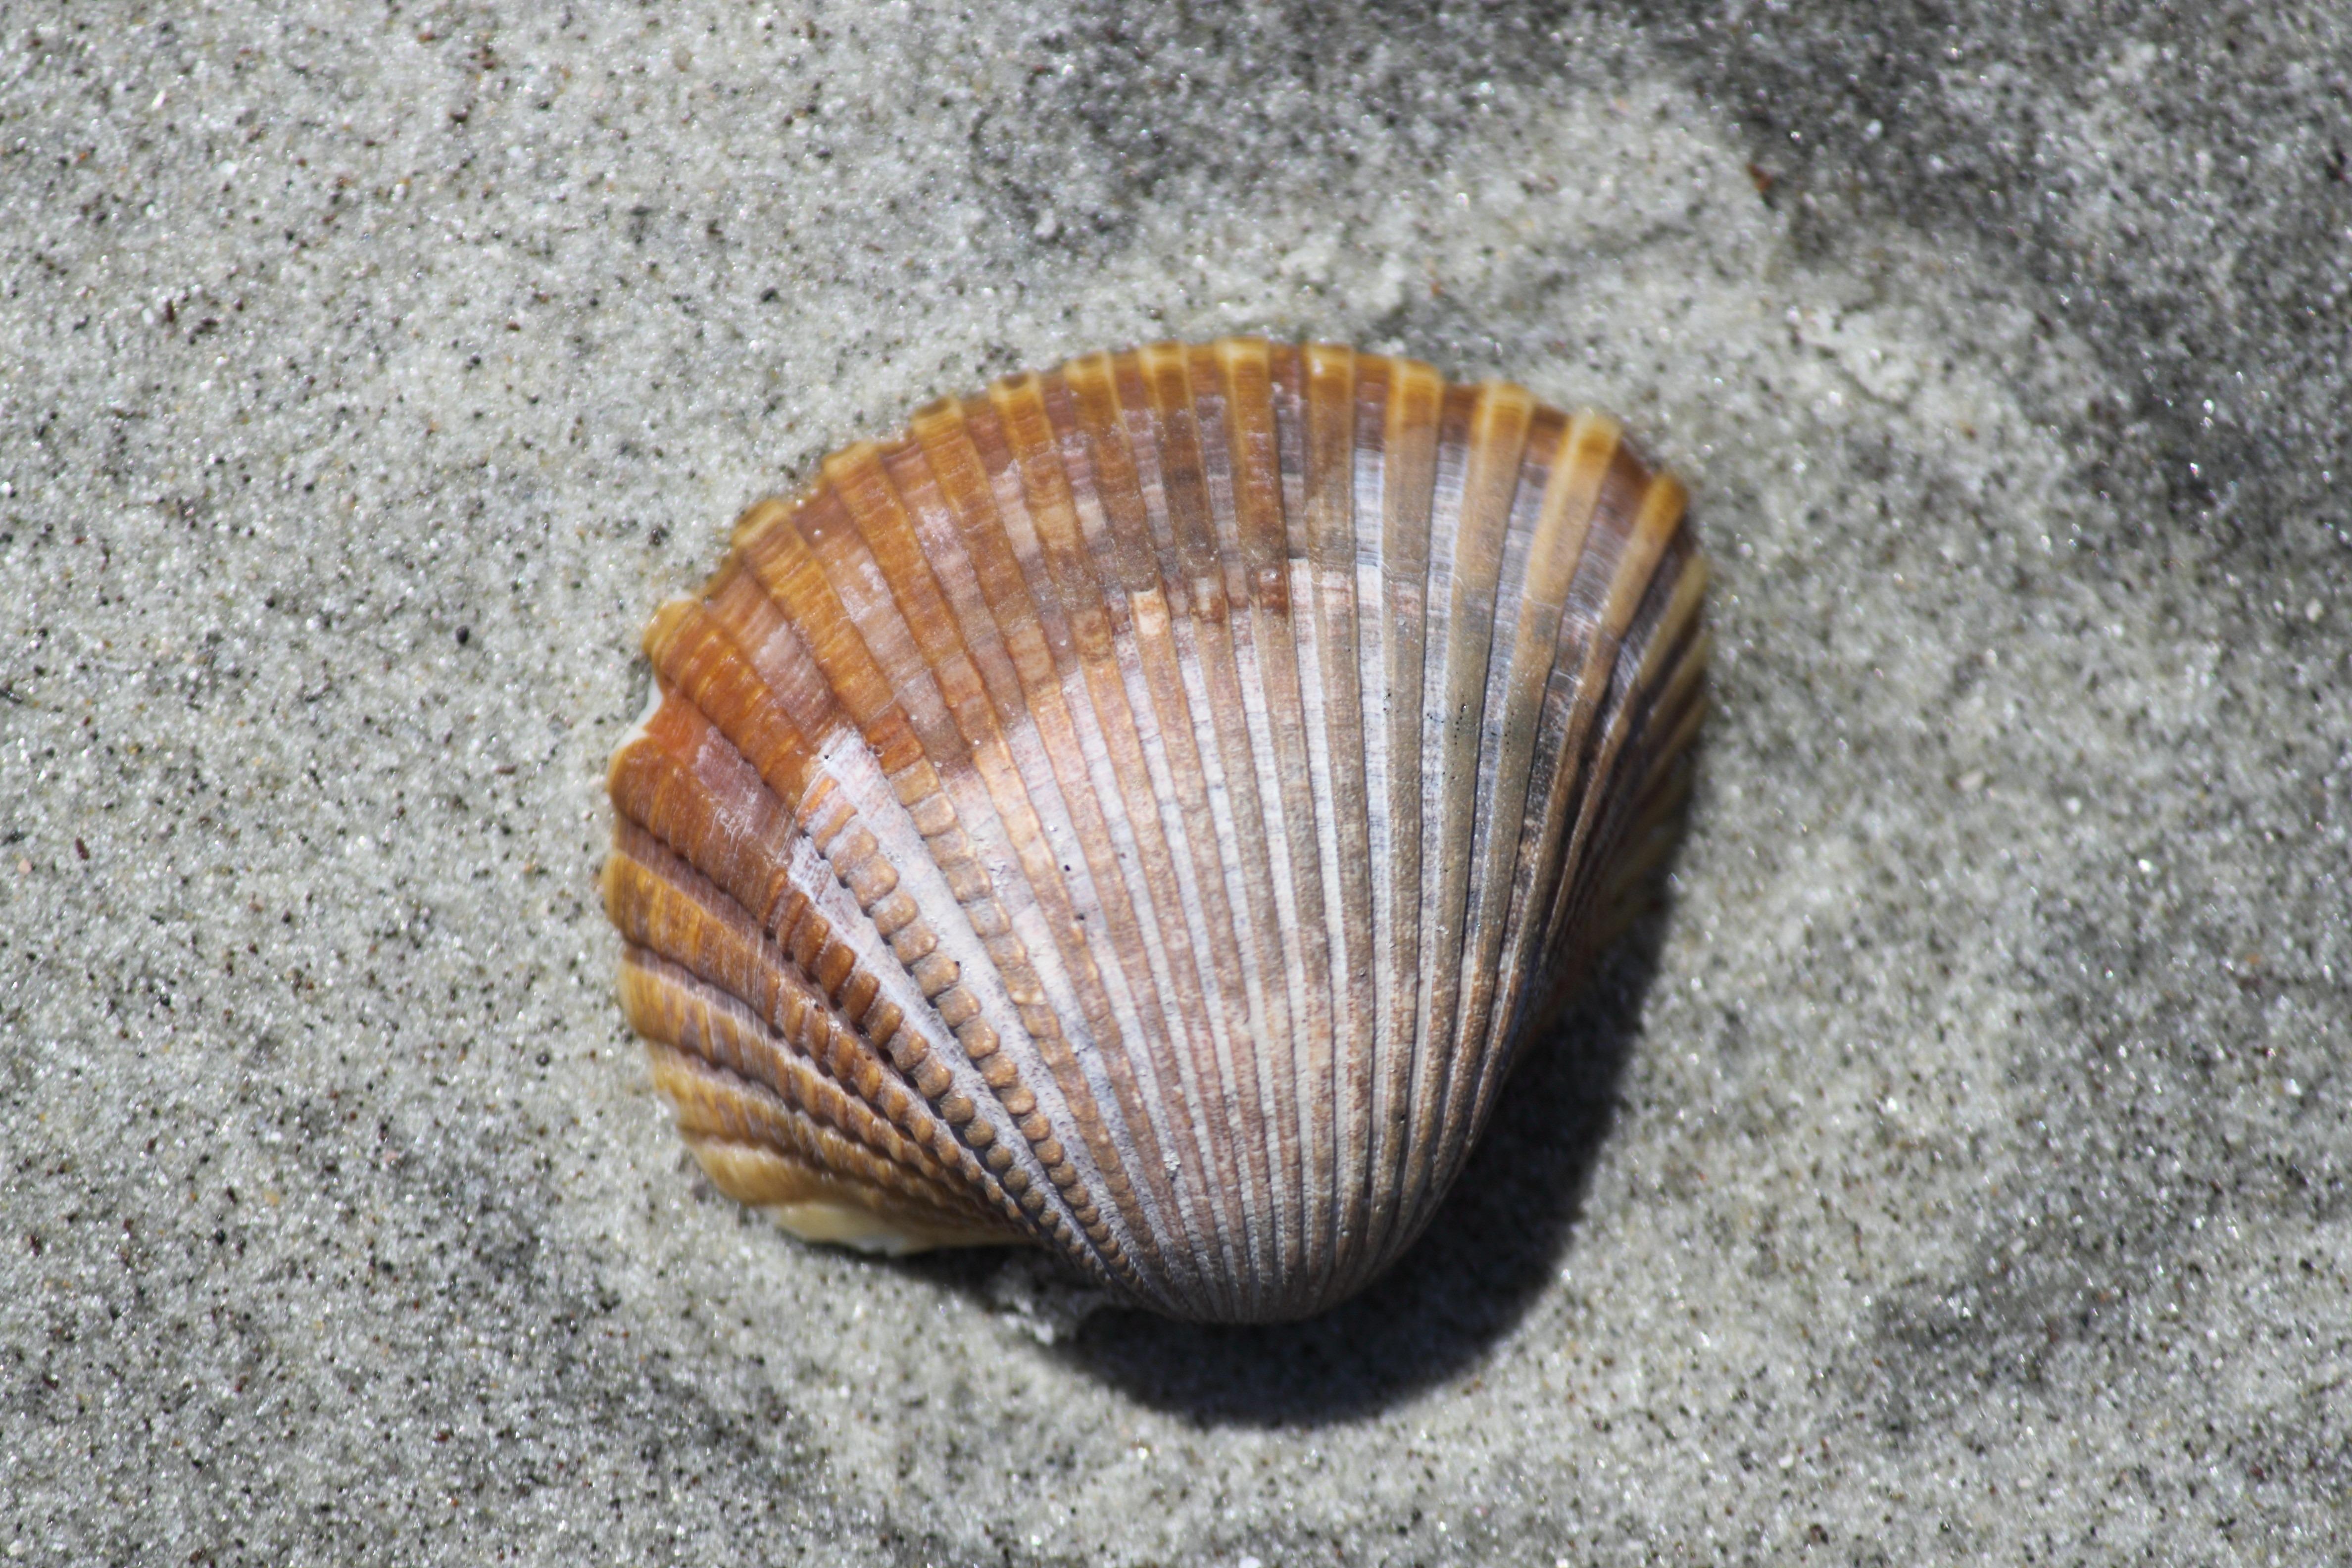 Gambar Pasir Makanan Laut Mati Pantai Laut Bahan Kulit